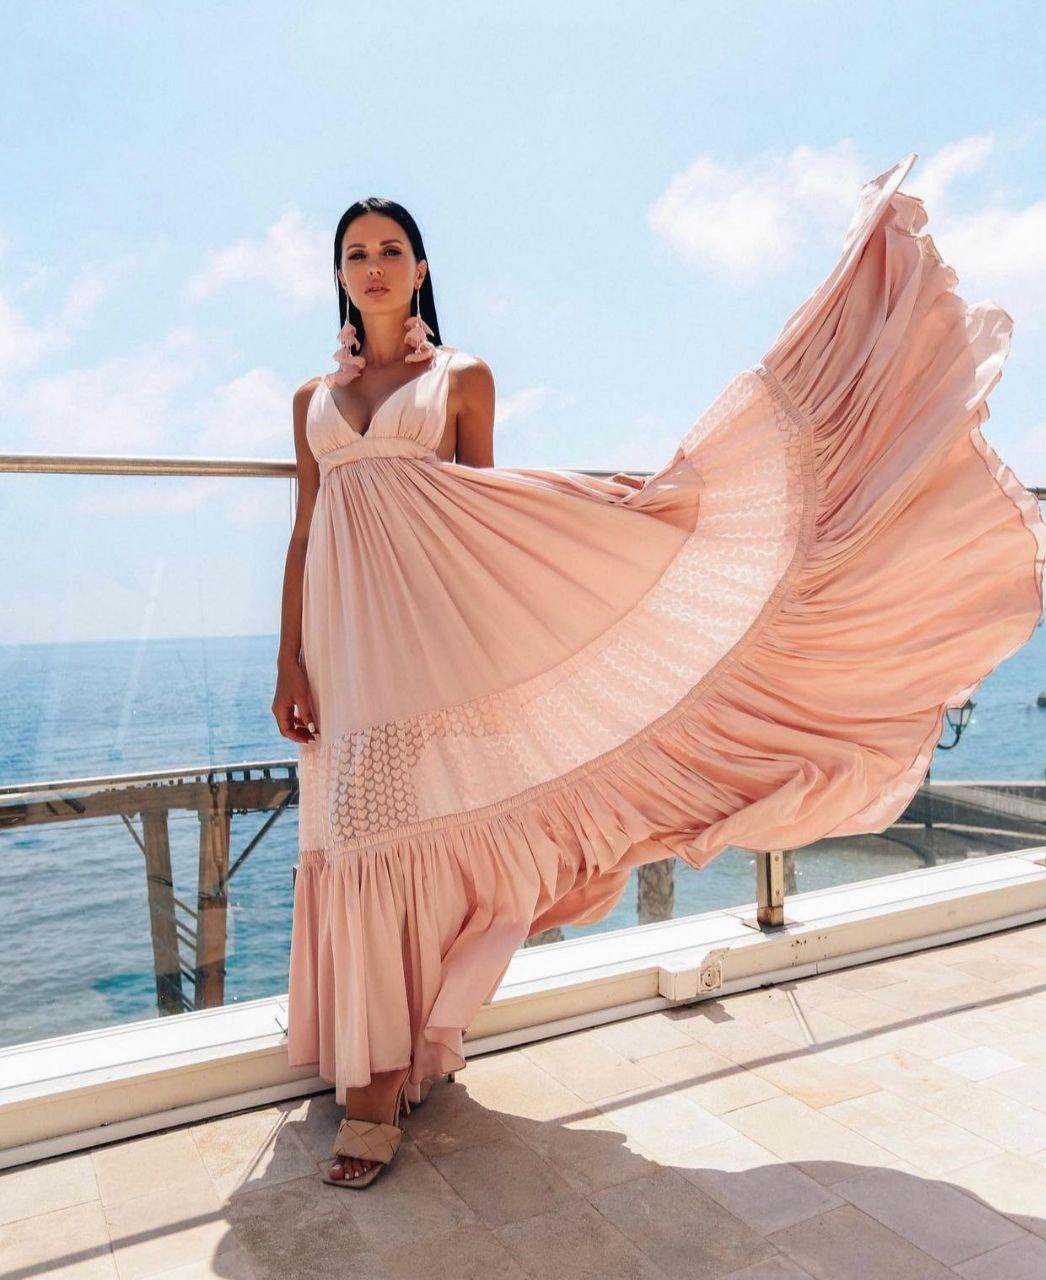 MATILDA PINK DRESS